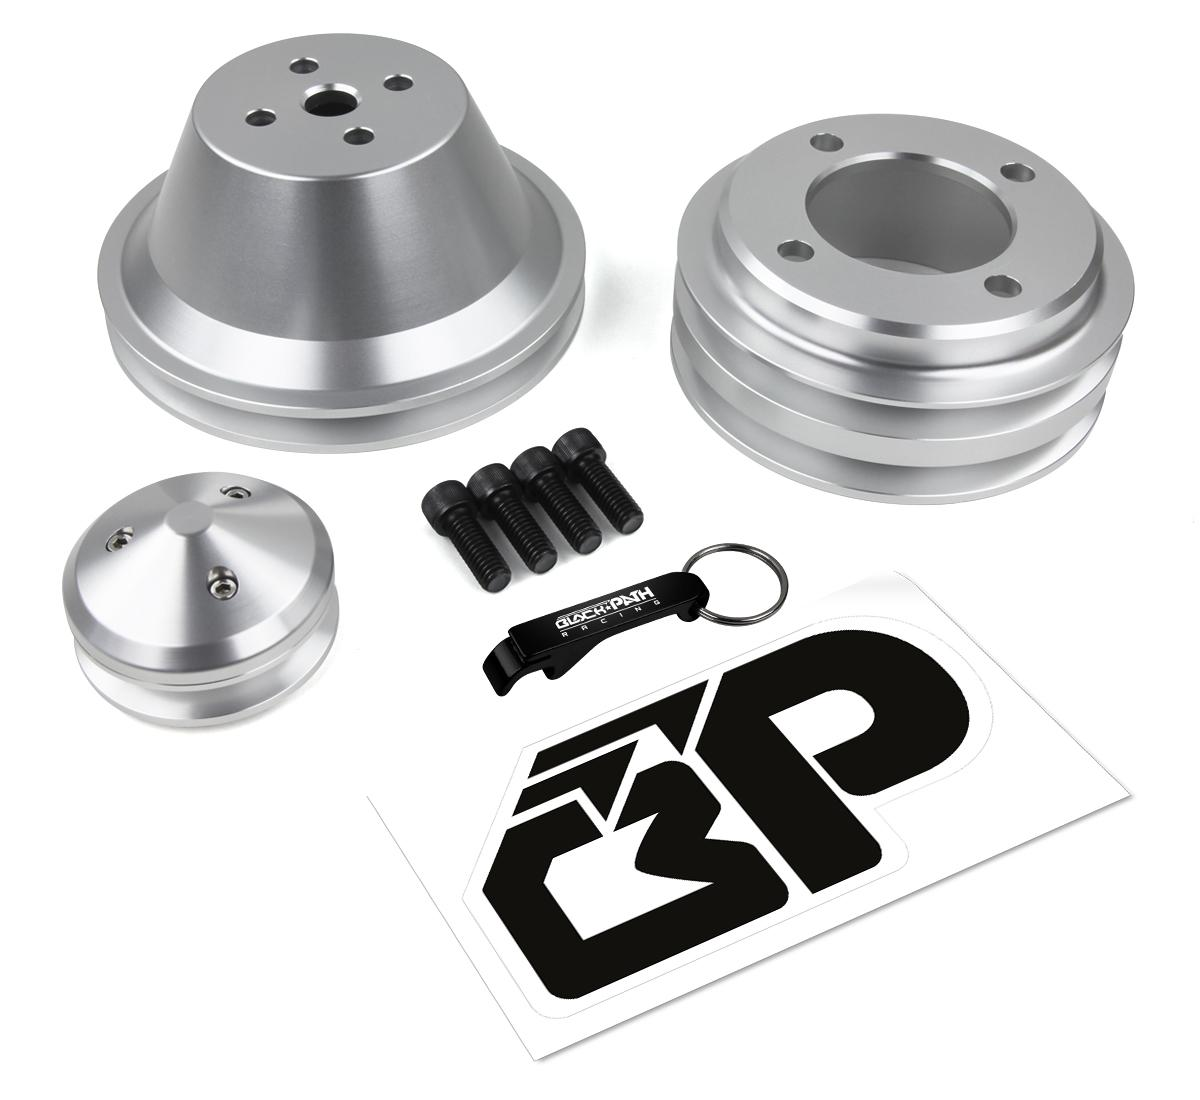 Ford V-Belt Pulley Kit 302 351W 351C 351M 400M Alternator